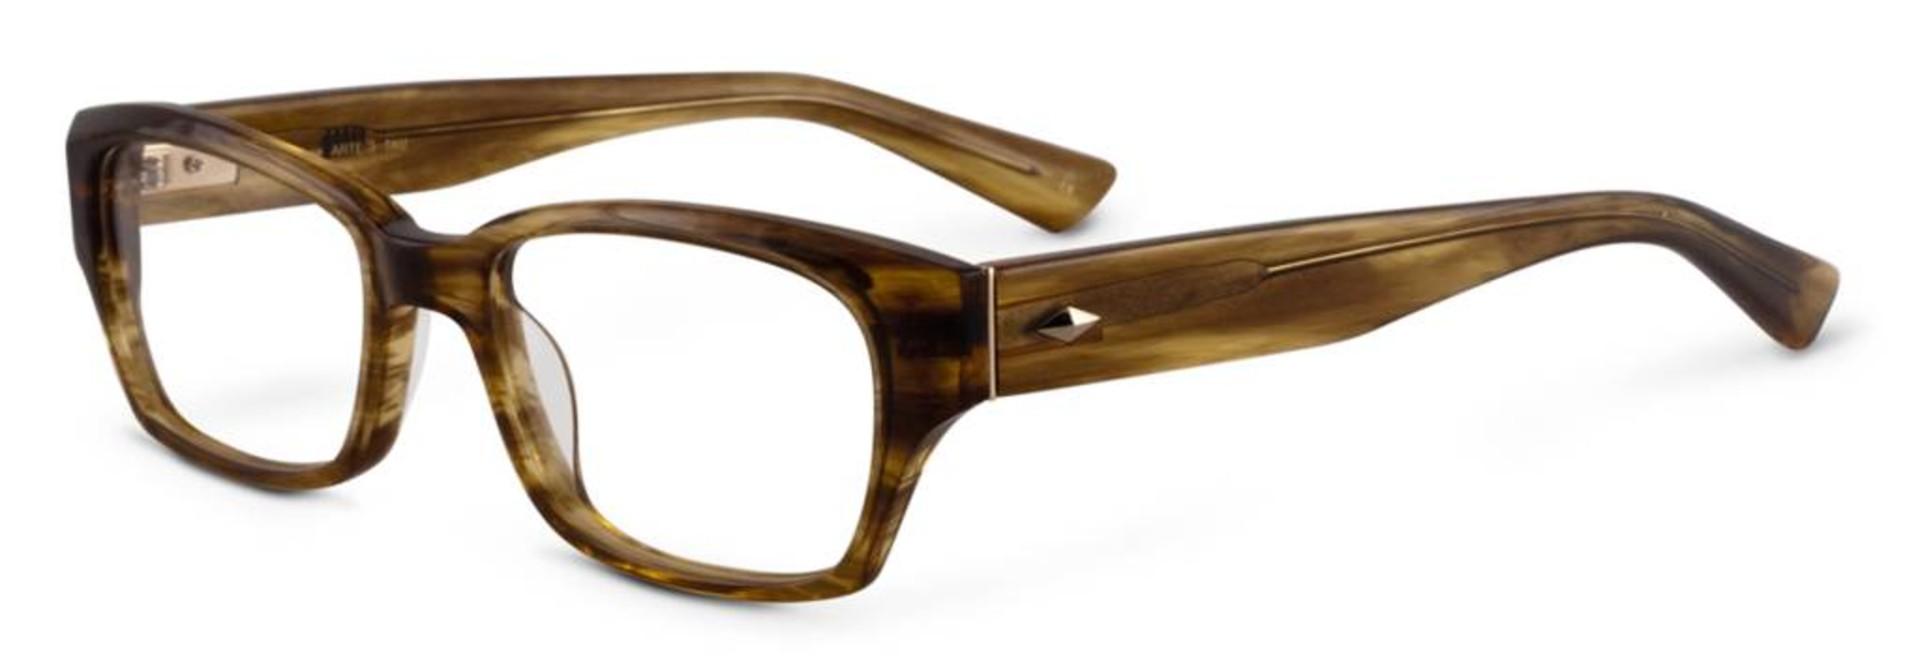 Arte 3 by Sama Eyewear